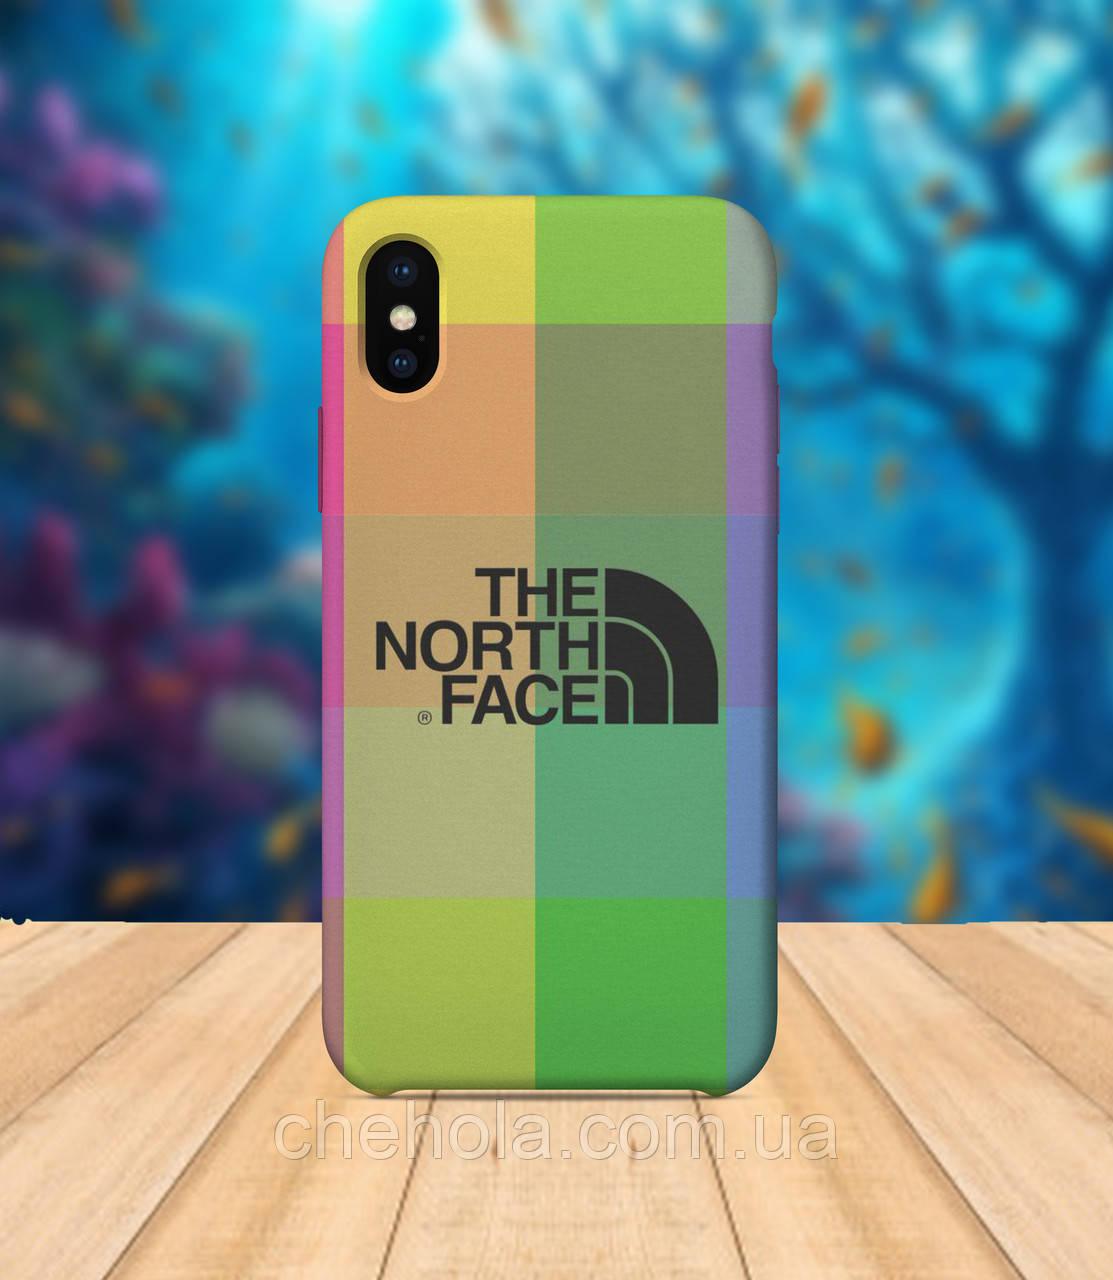 Чехол для apple iphone x XS max В стиле The North Face чехол с принтом